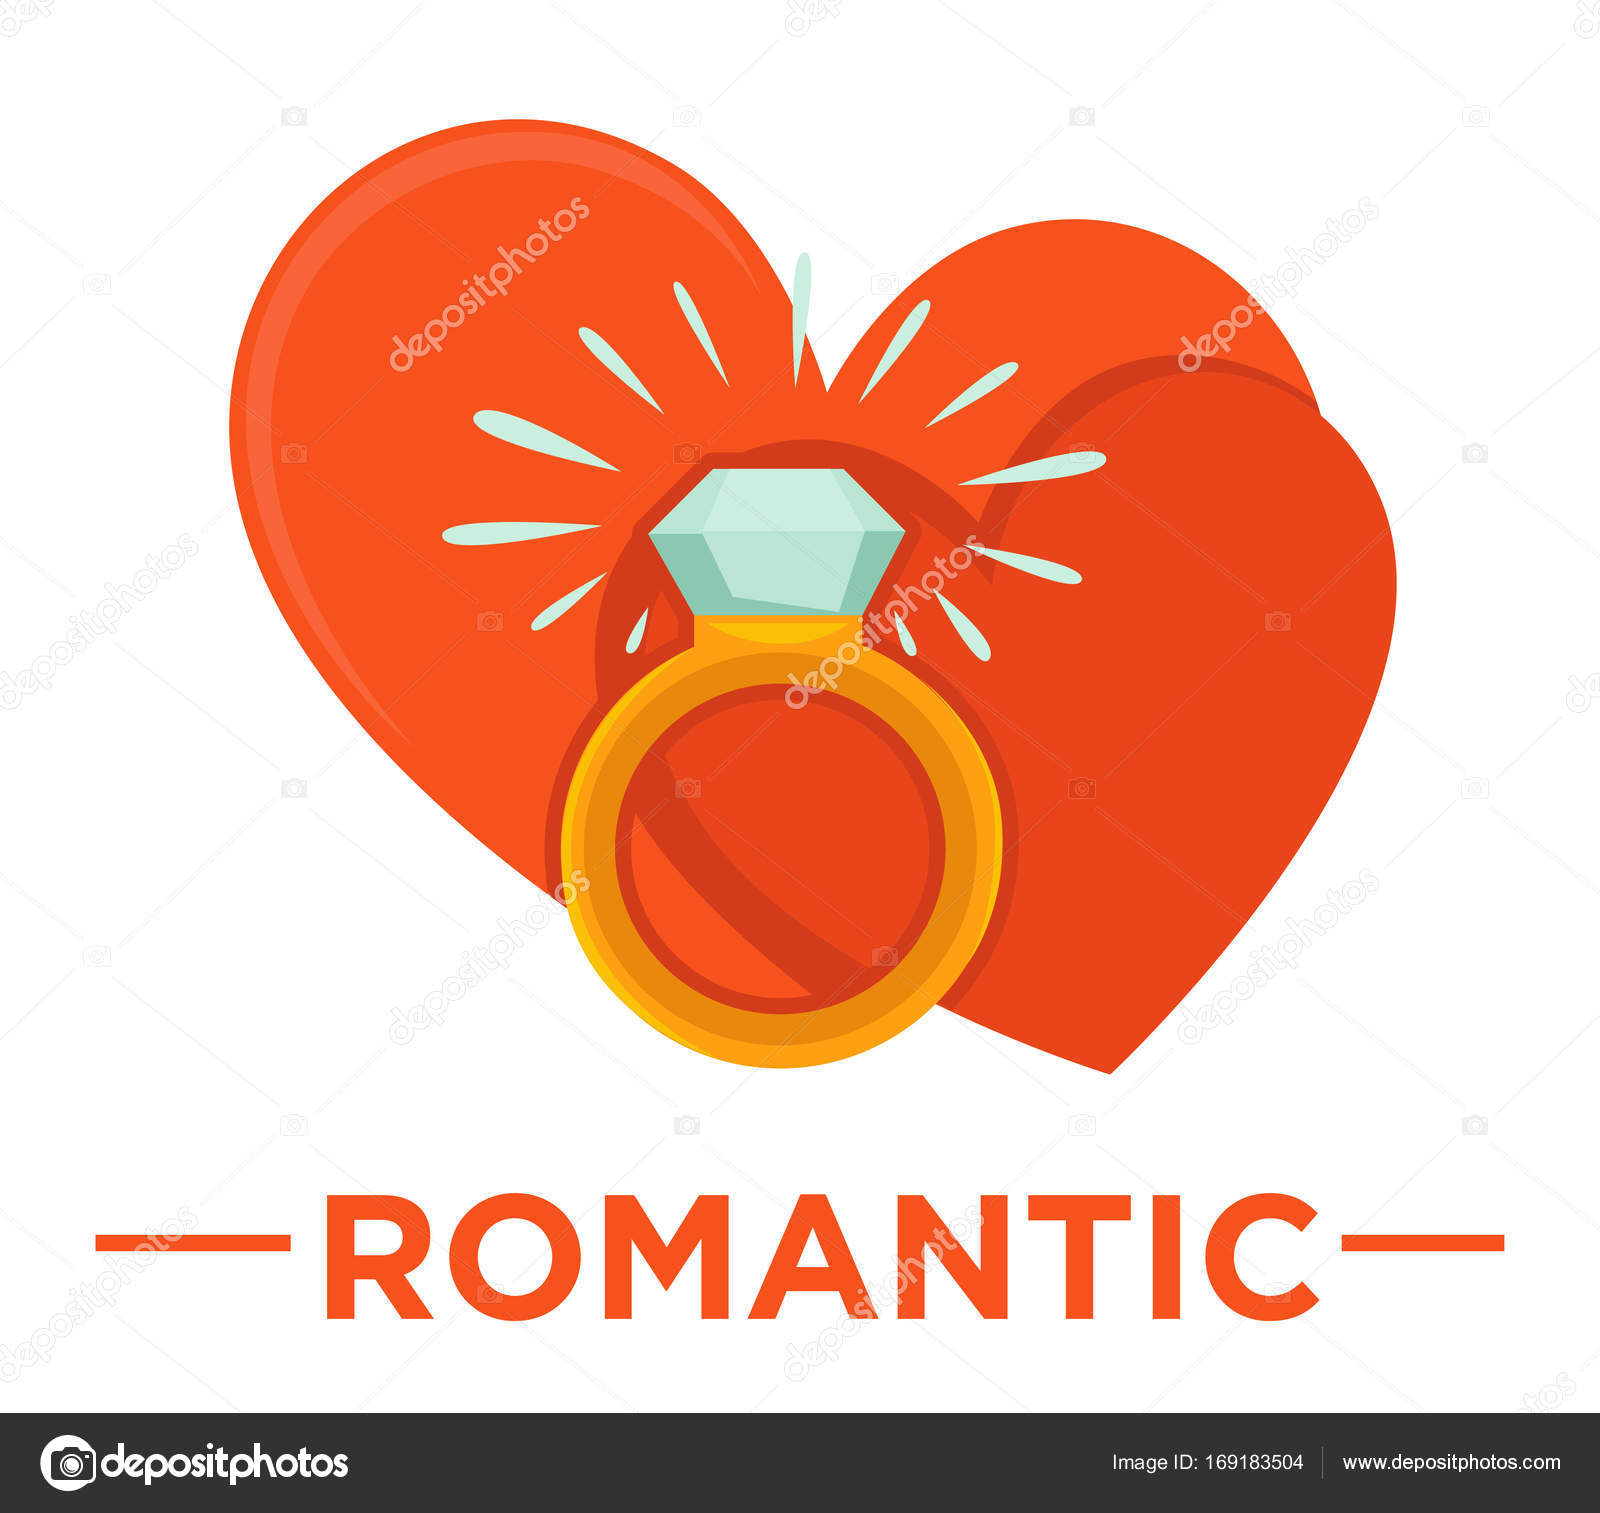 Movie romantic genre icon stock vector sonulkaster 169183504 movie romantic genre icon with red hearts and ring with diamond symbols for cinema or channel movie genre tag vector by sonulkaster biocorpaavc